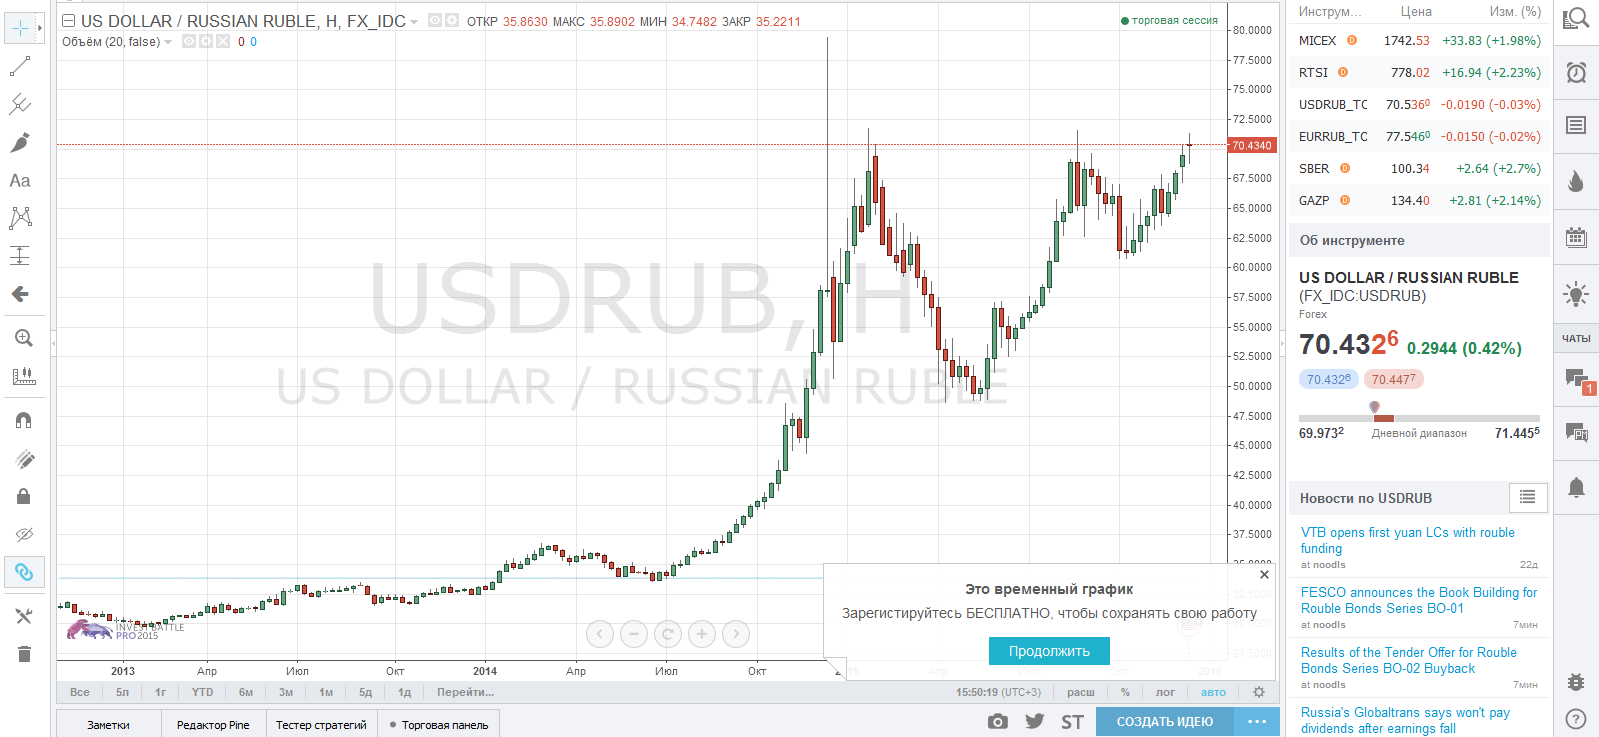 Курс доллара график за 2 недели